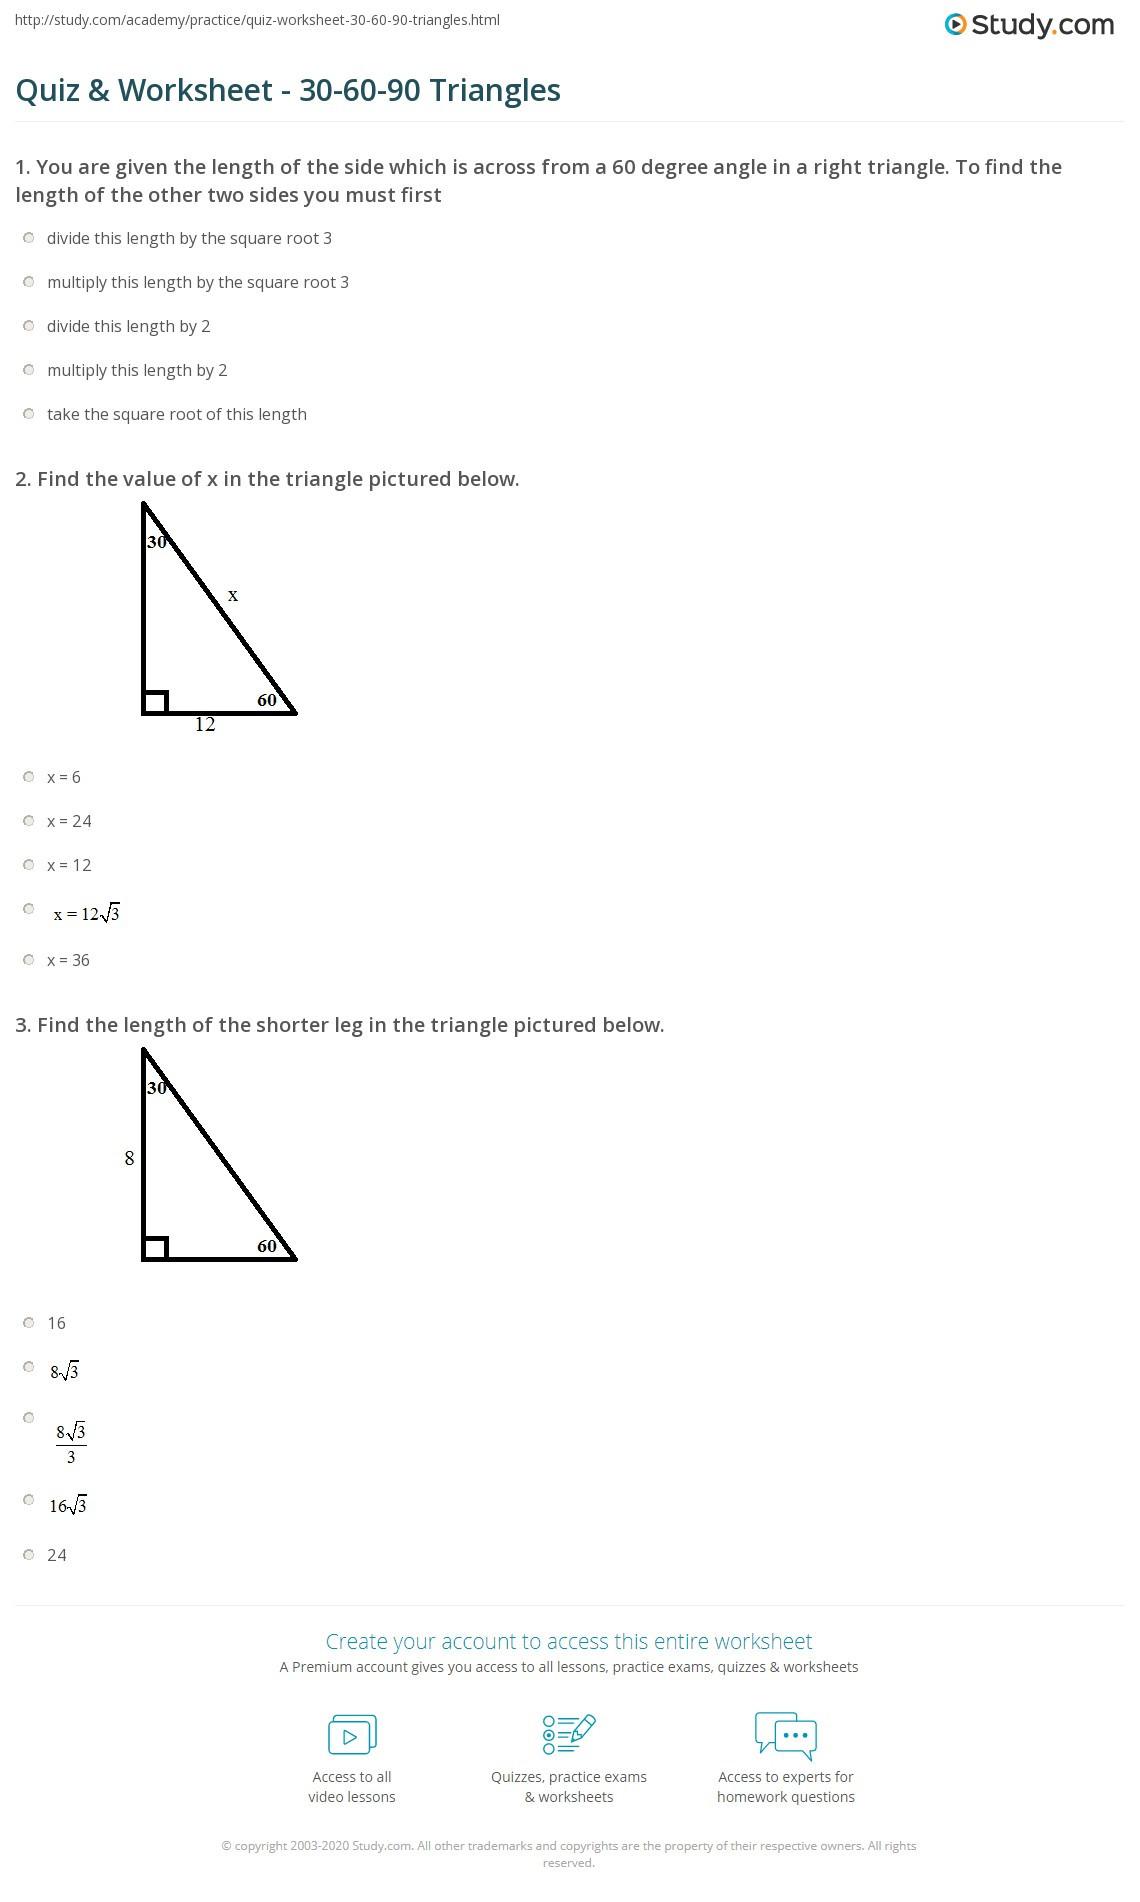 Special Right Triangles Practice Worksheet 61 Practice Worksheet Law Sines Aas asa